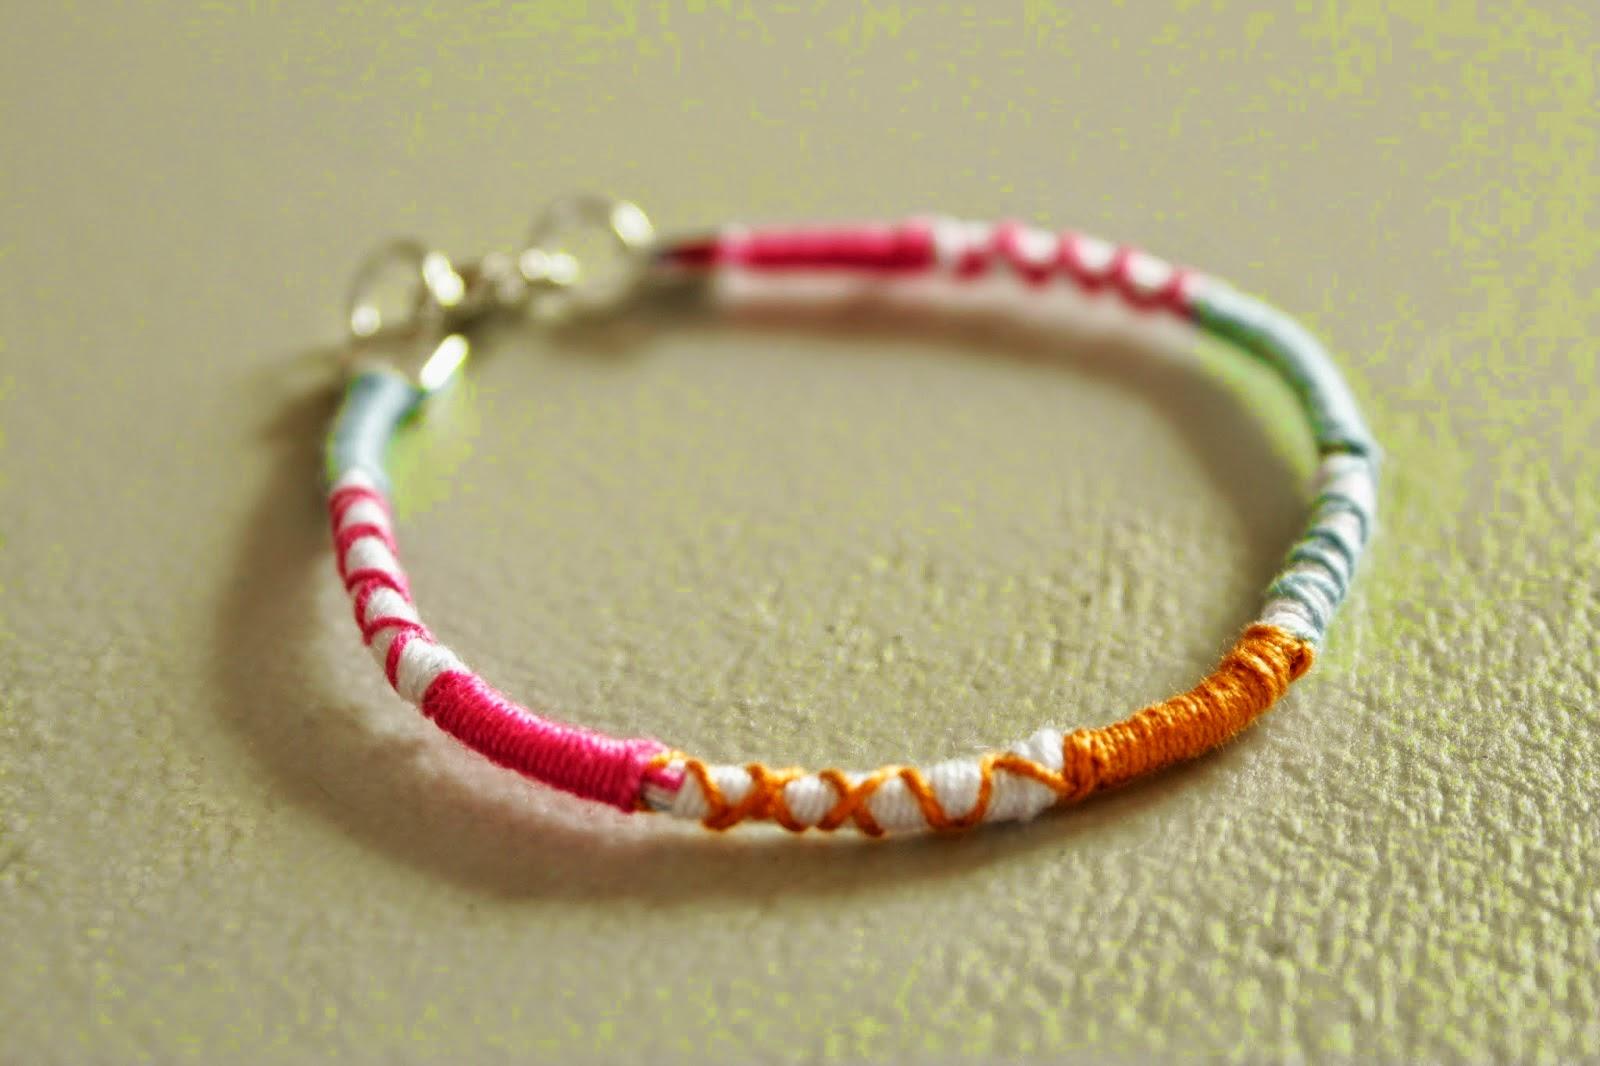 http://curlymade.blogspot.pt/2014/07/diy-wrap-friendship-bracelet.html